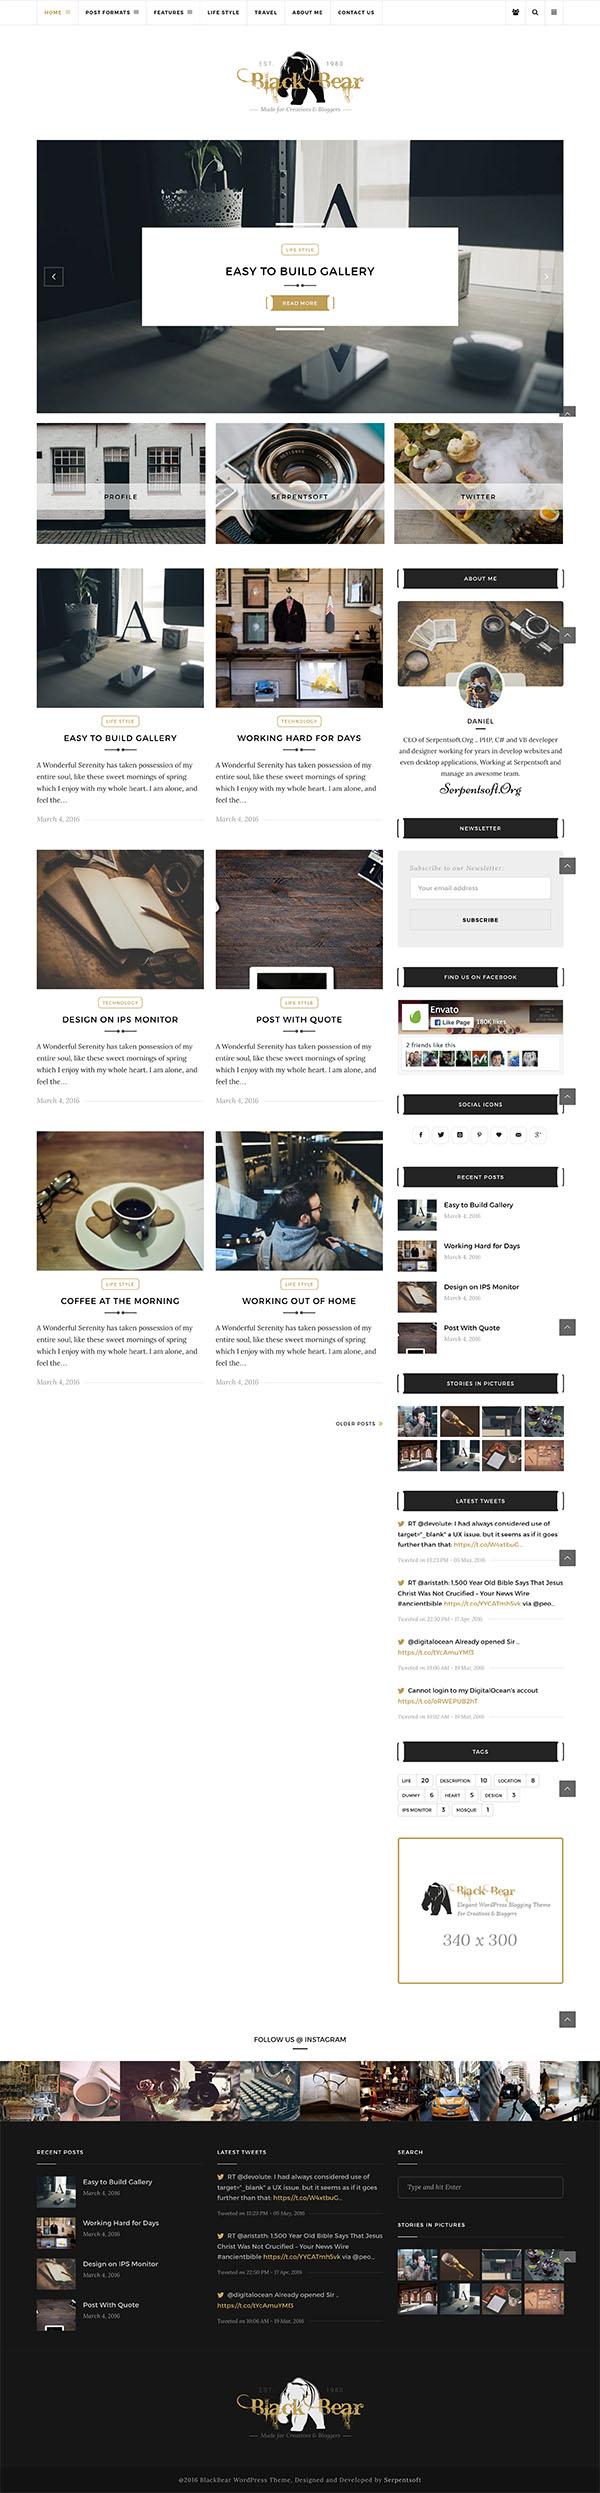 14 Black Bear - Responsive WordPress Blog Theme